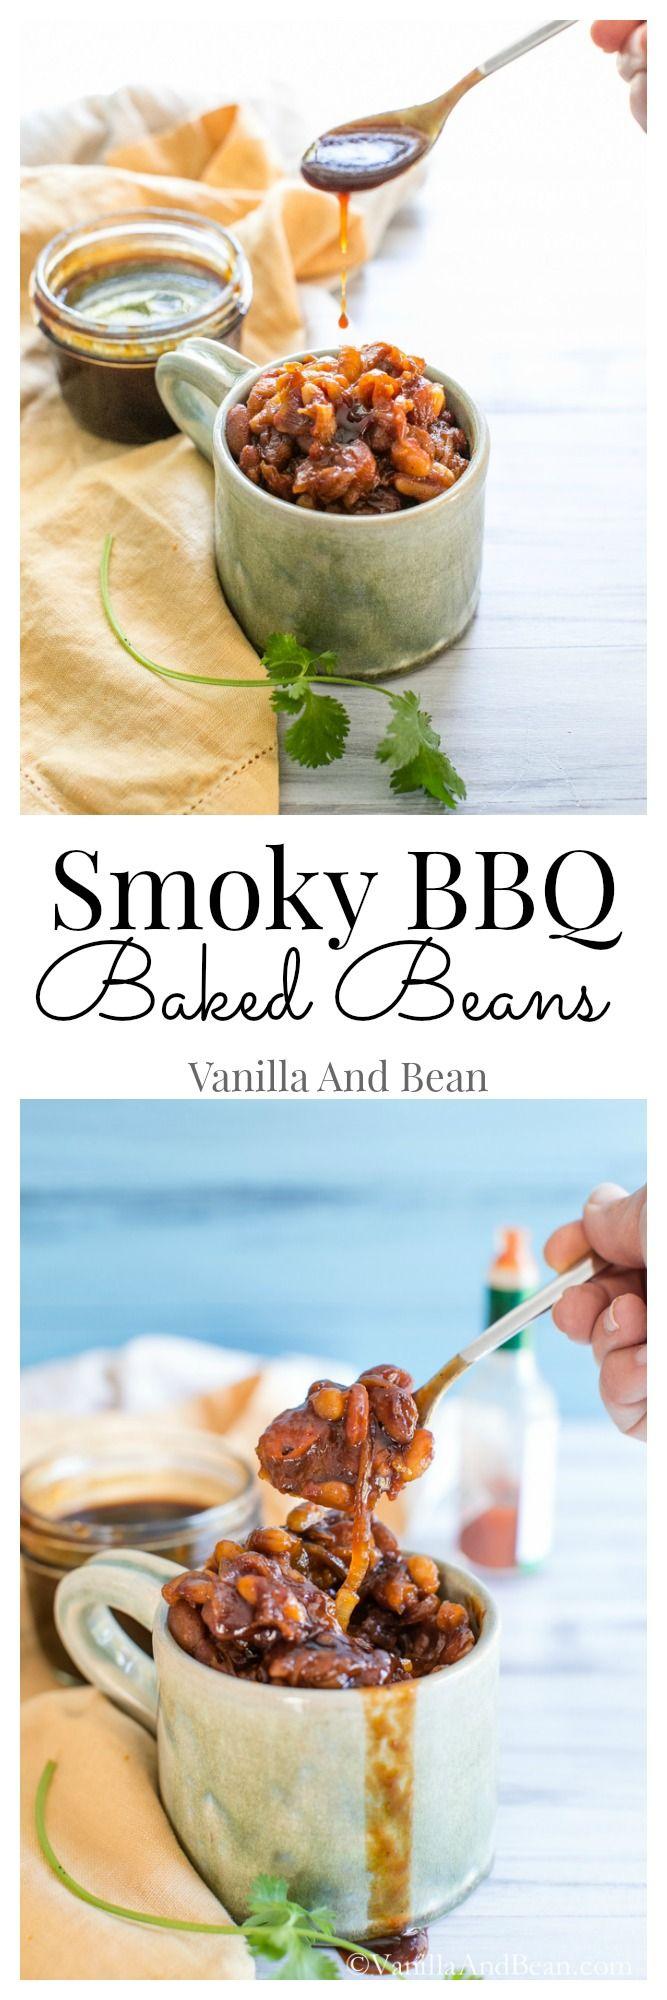 Smoky BBQ Baked Beans   Vanilla And Bean